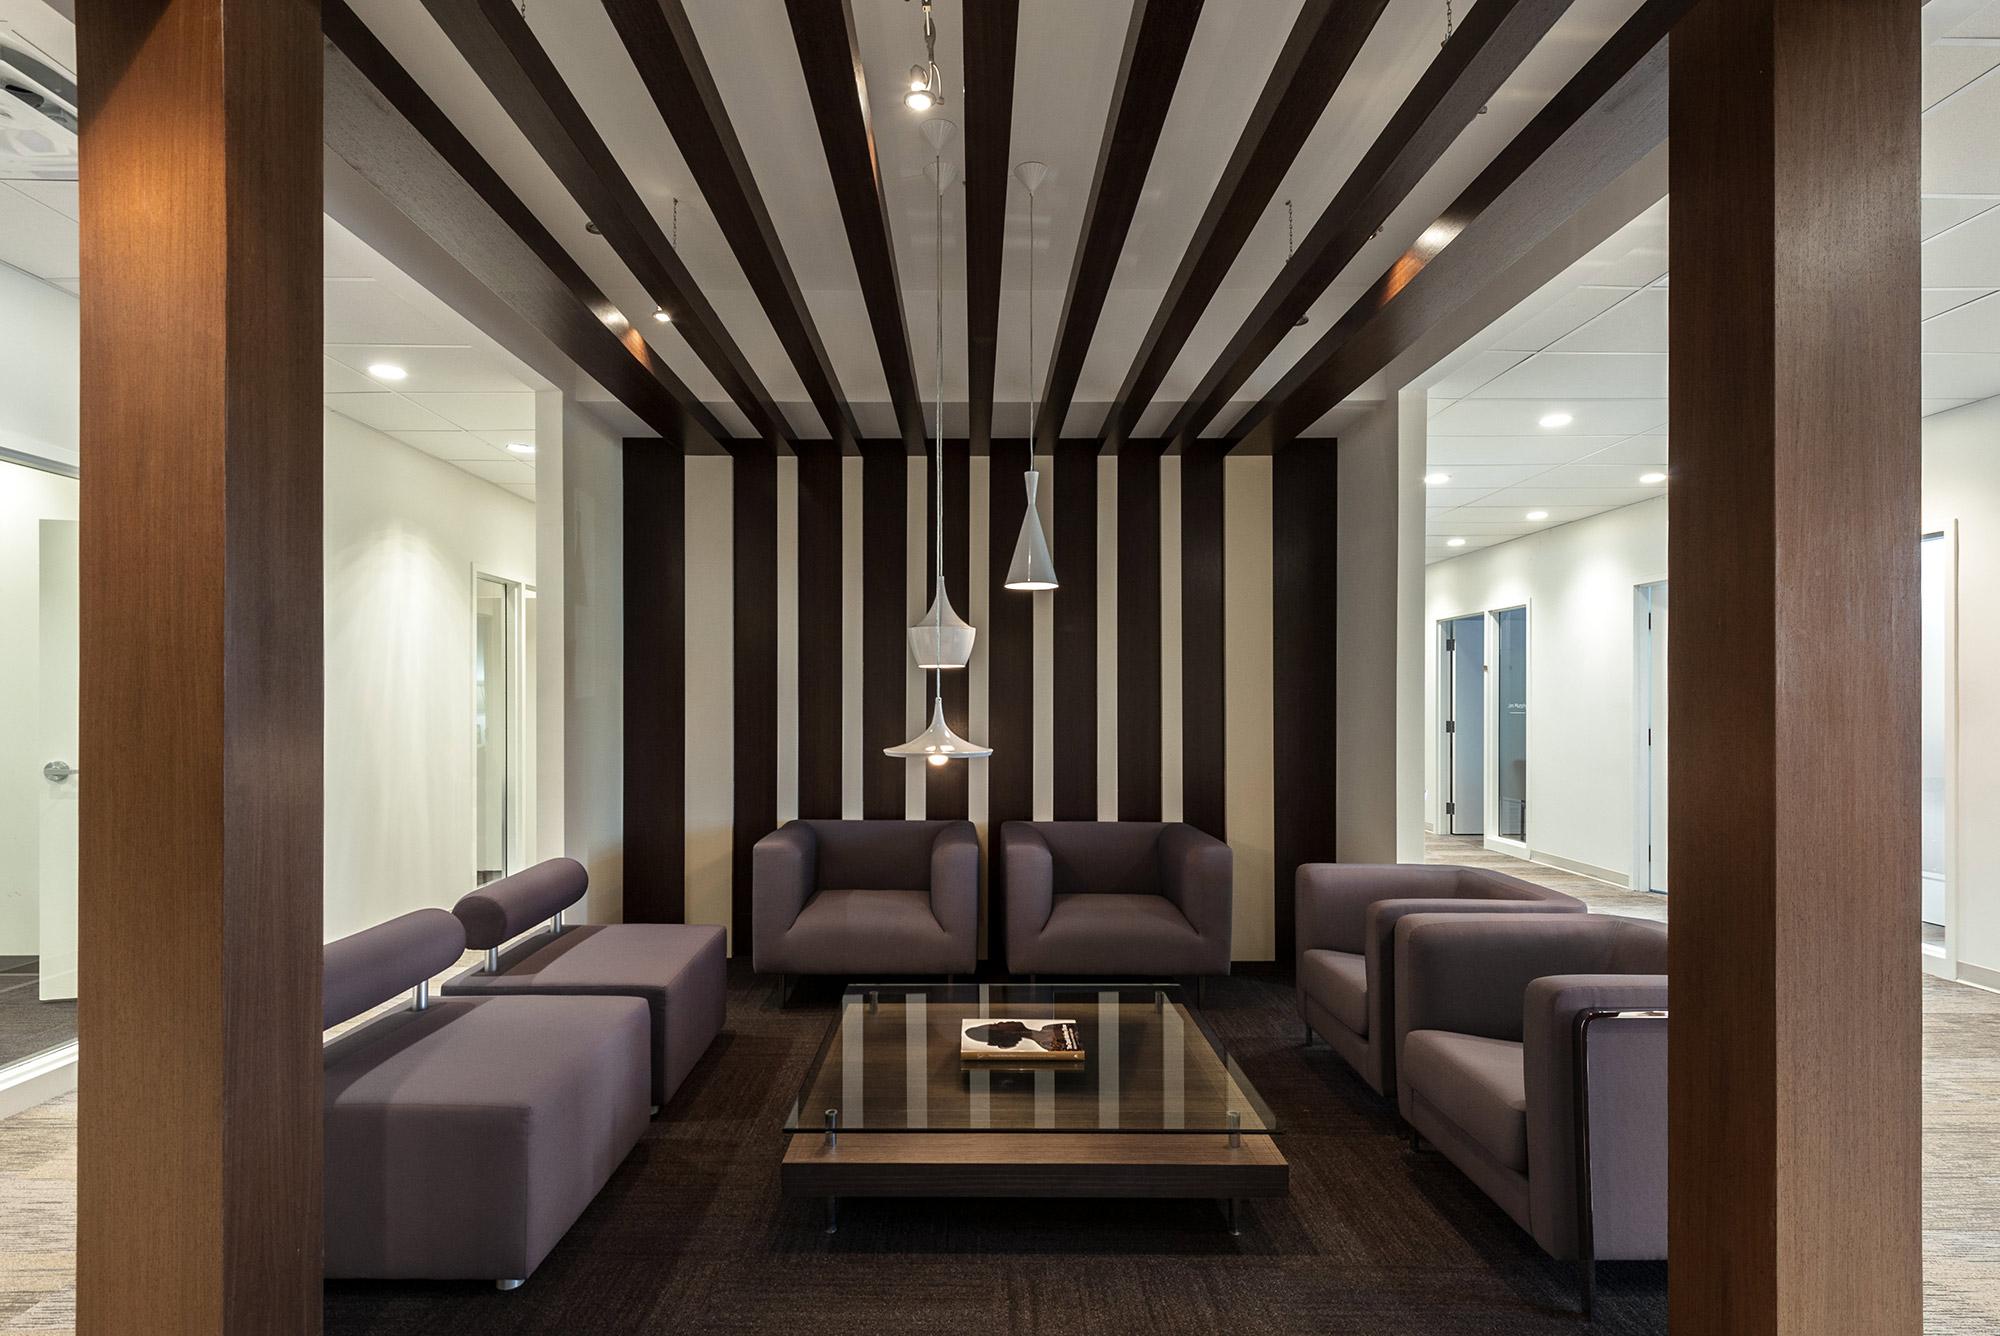 interior-design-real-estate-office-pruple-chairs.jpg